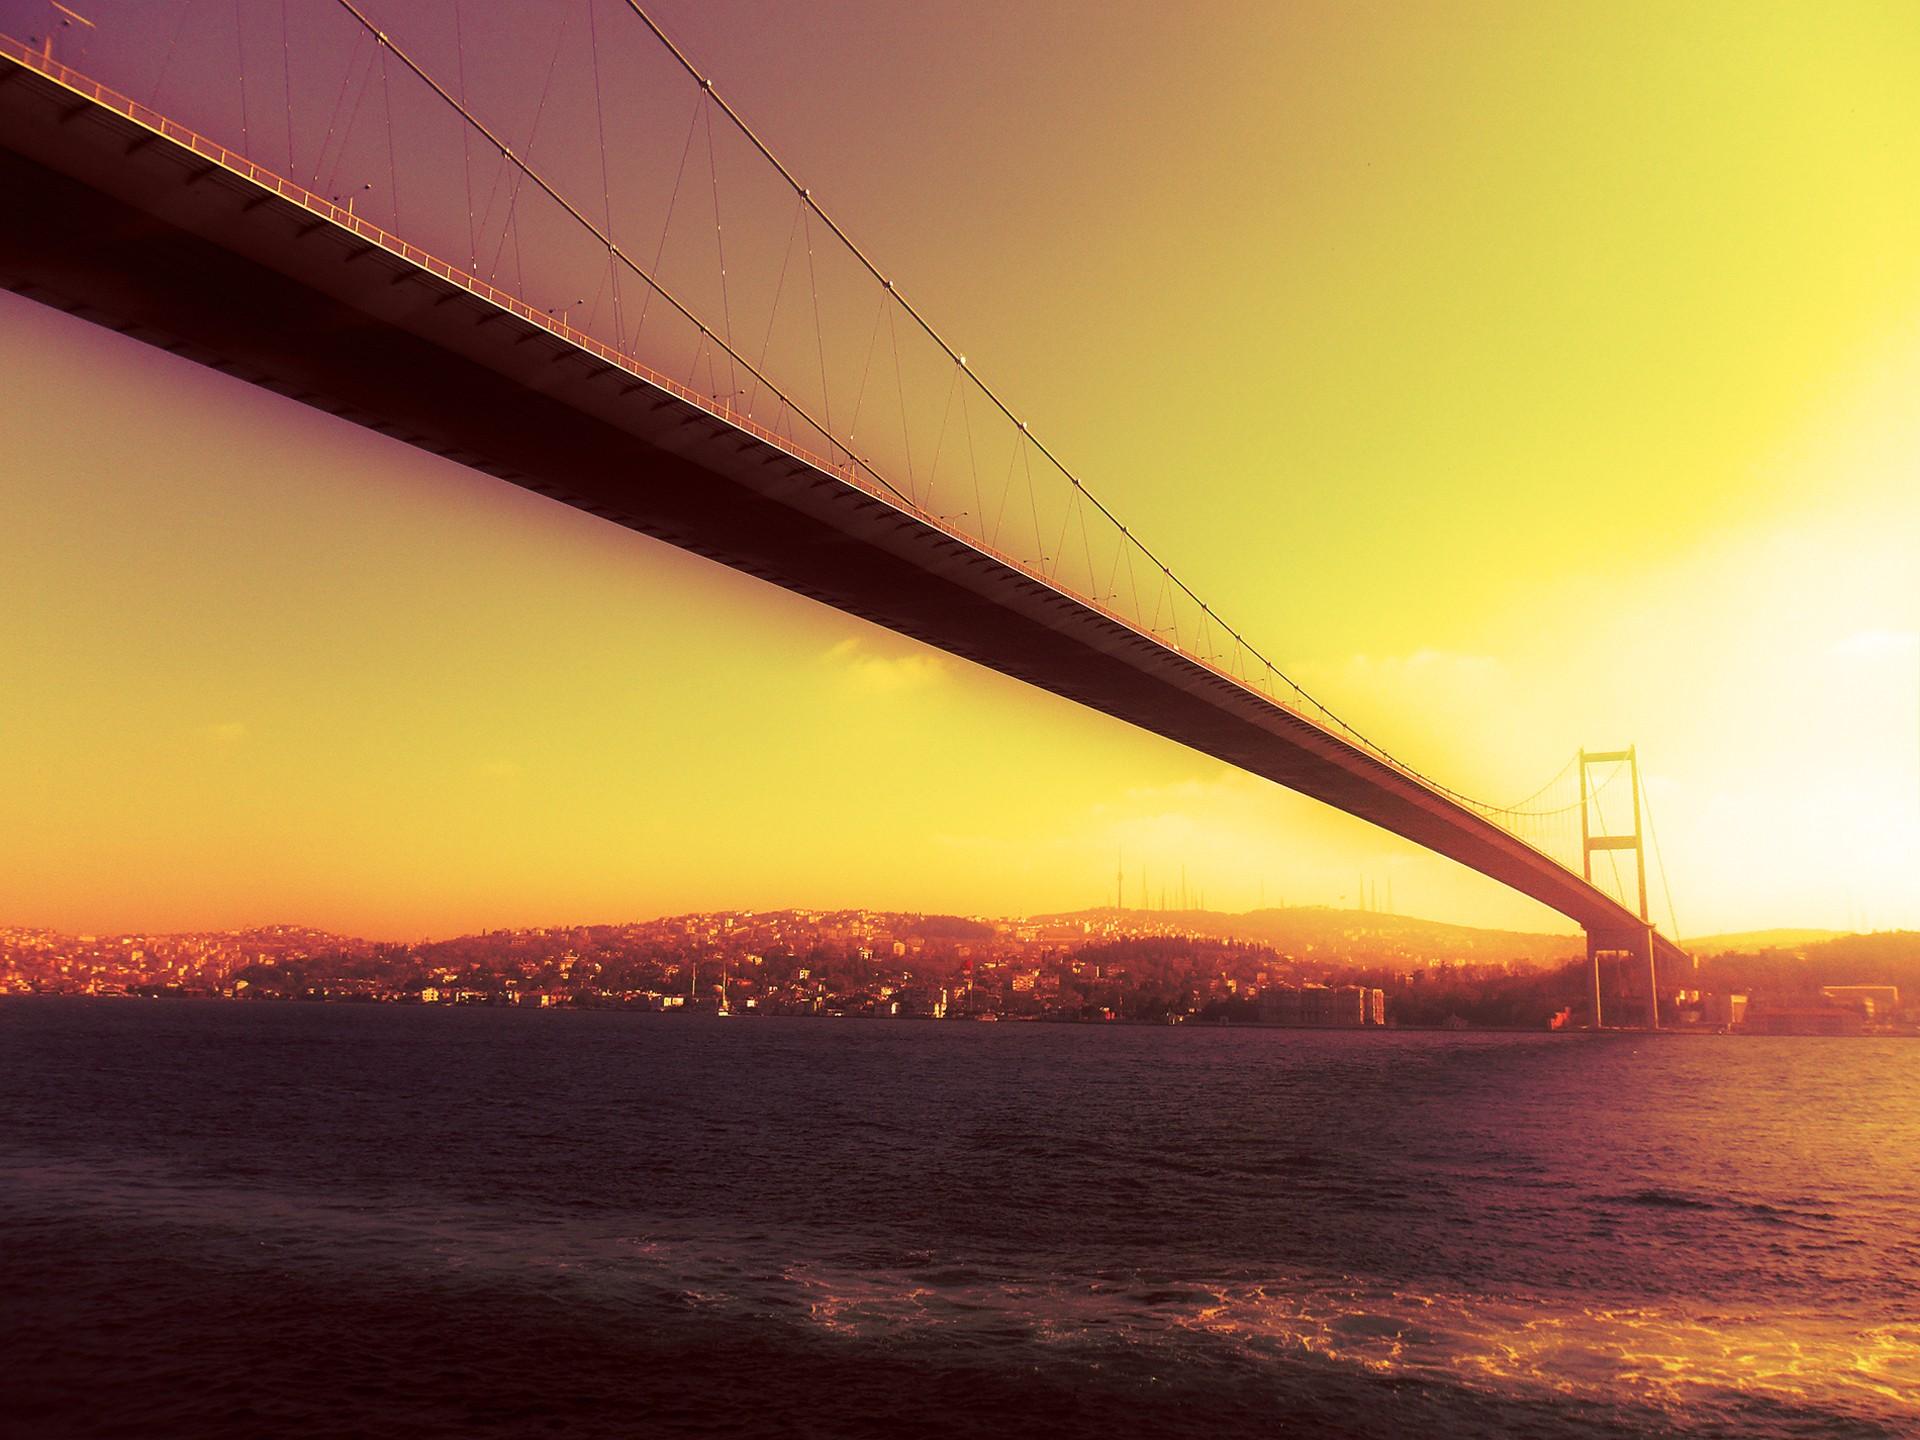 General 1920x1440 Istanbul Bosphorus bridge sunset